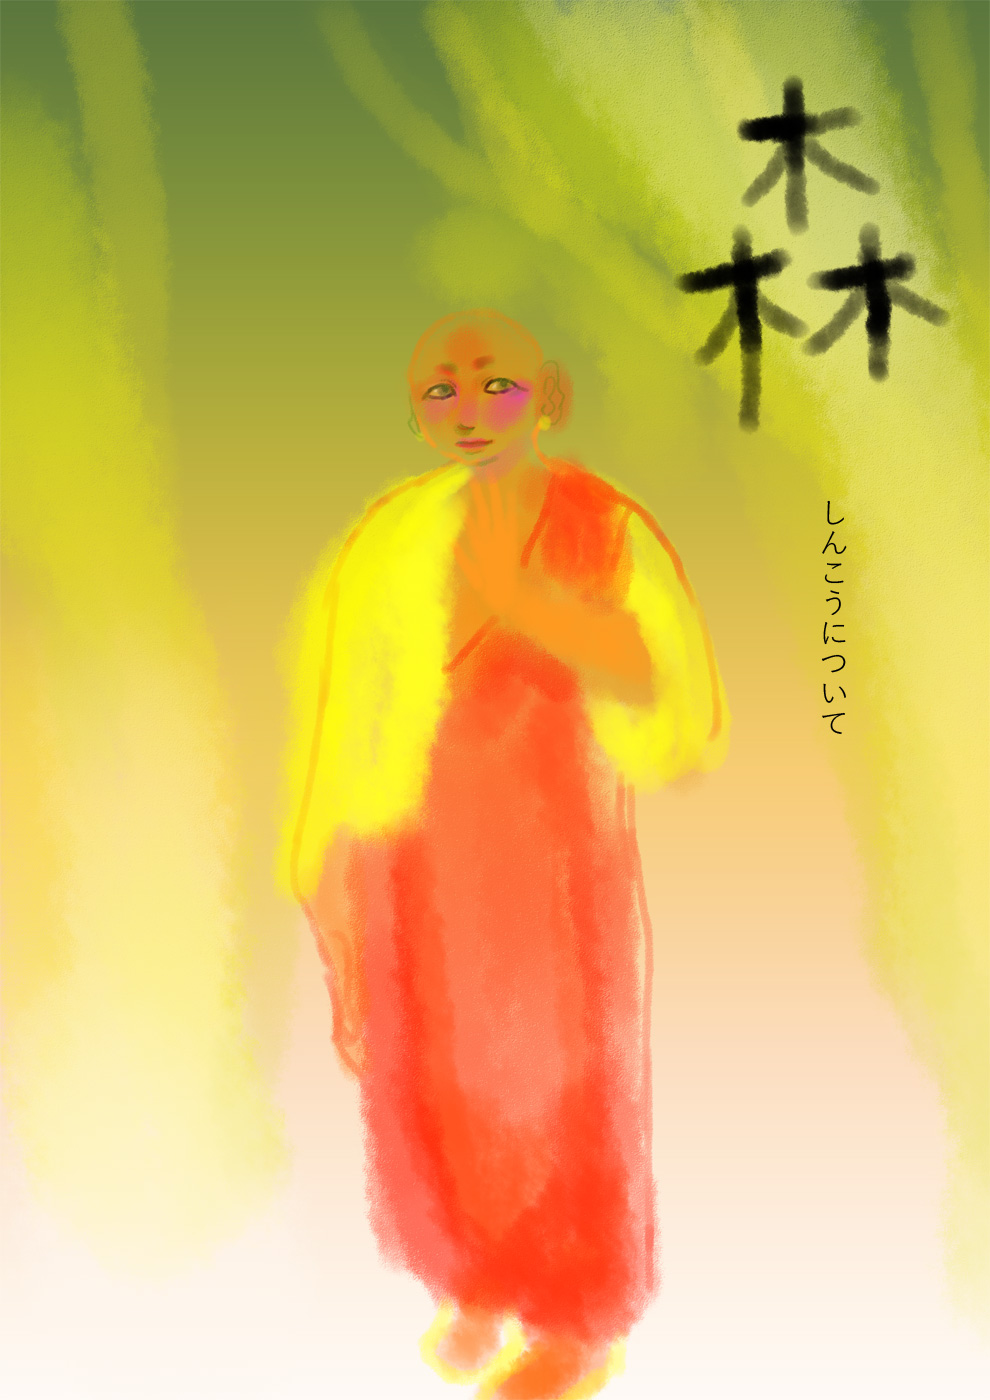 http://ahito.com/comic/ehon/voice/img/2018/20180324/01.jpg